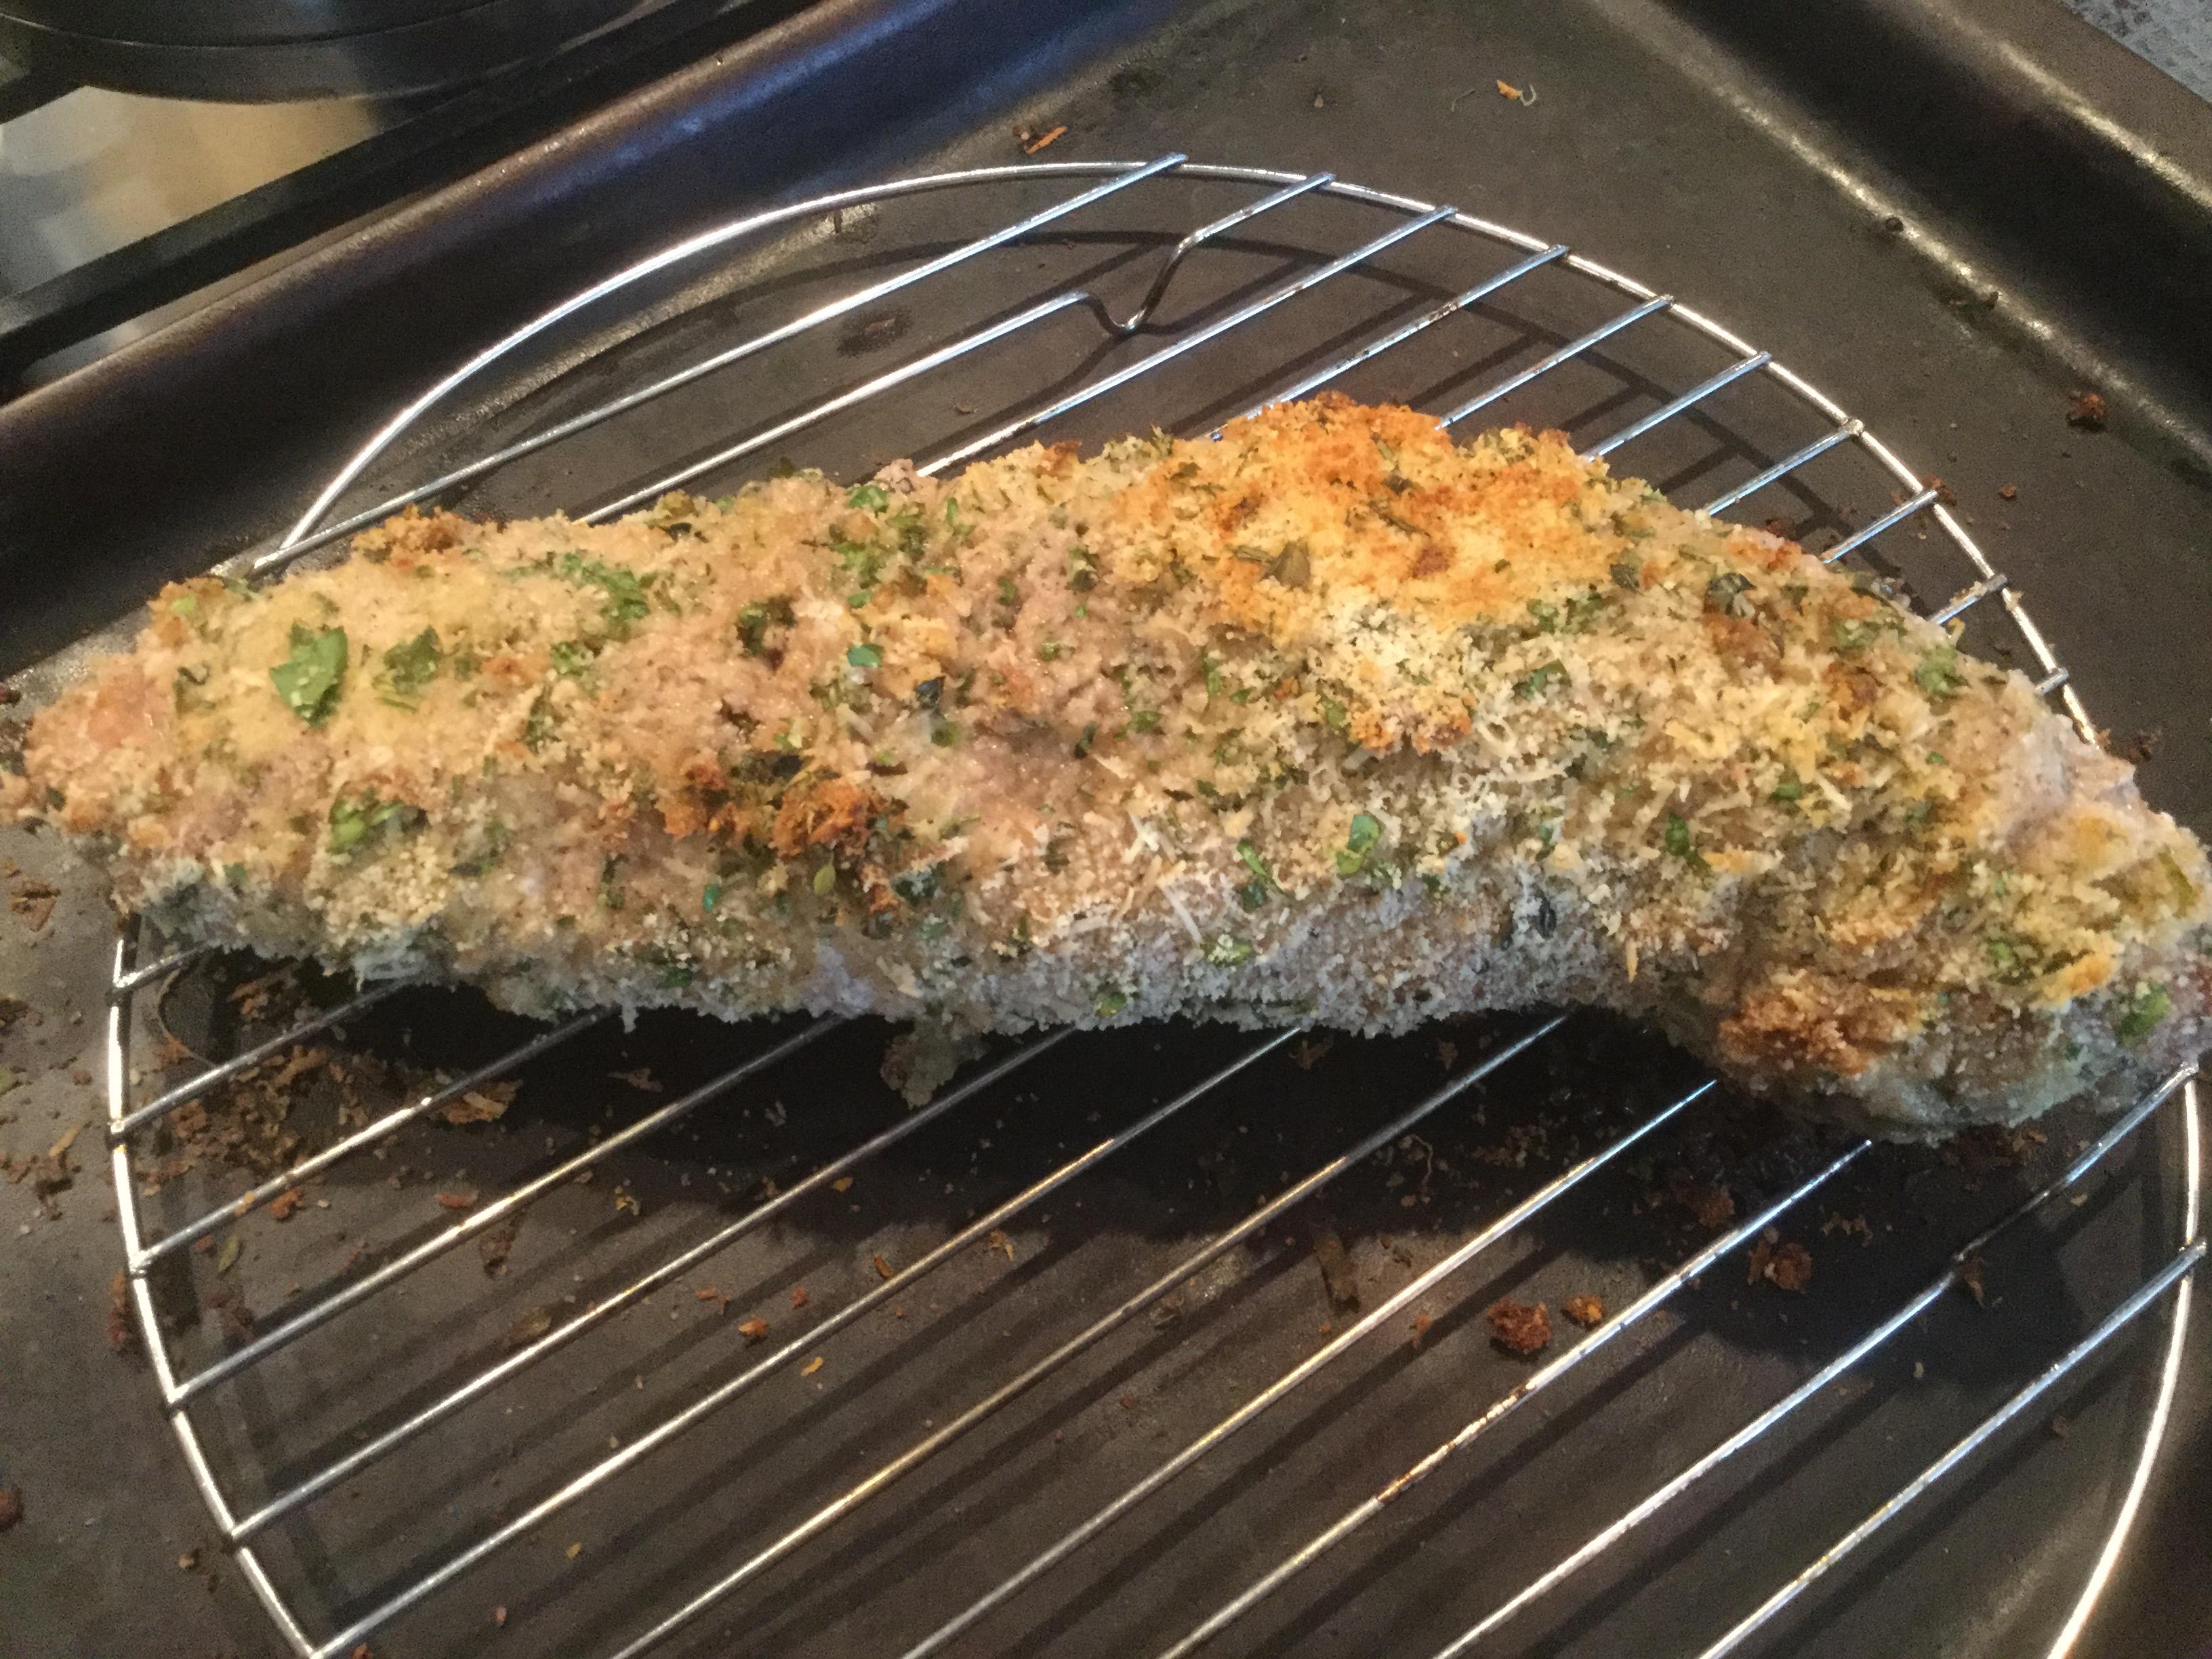 Parsley and Parmesan Crusted Pork Tenderloin